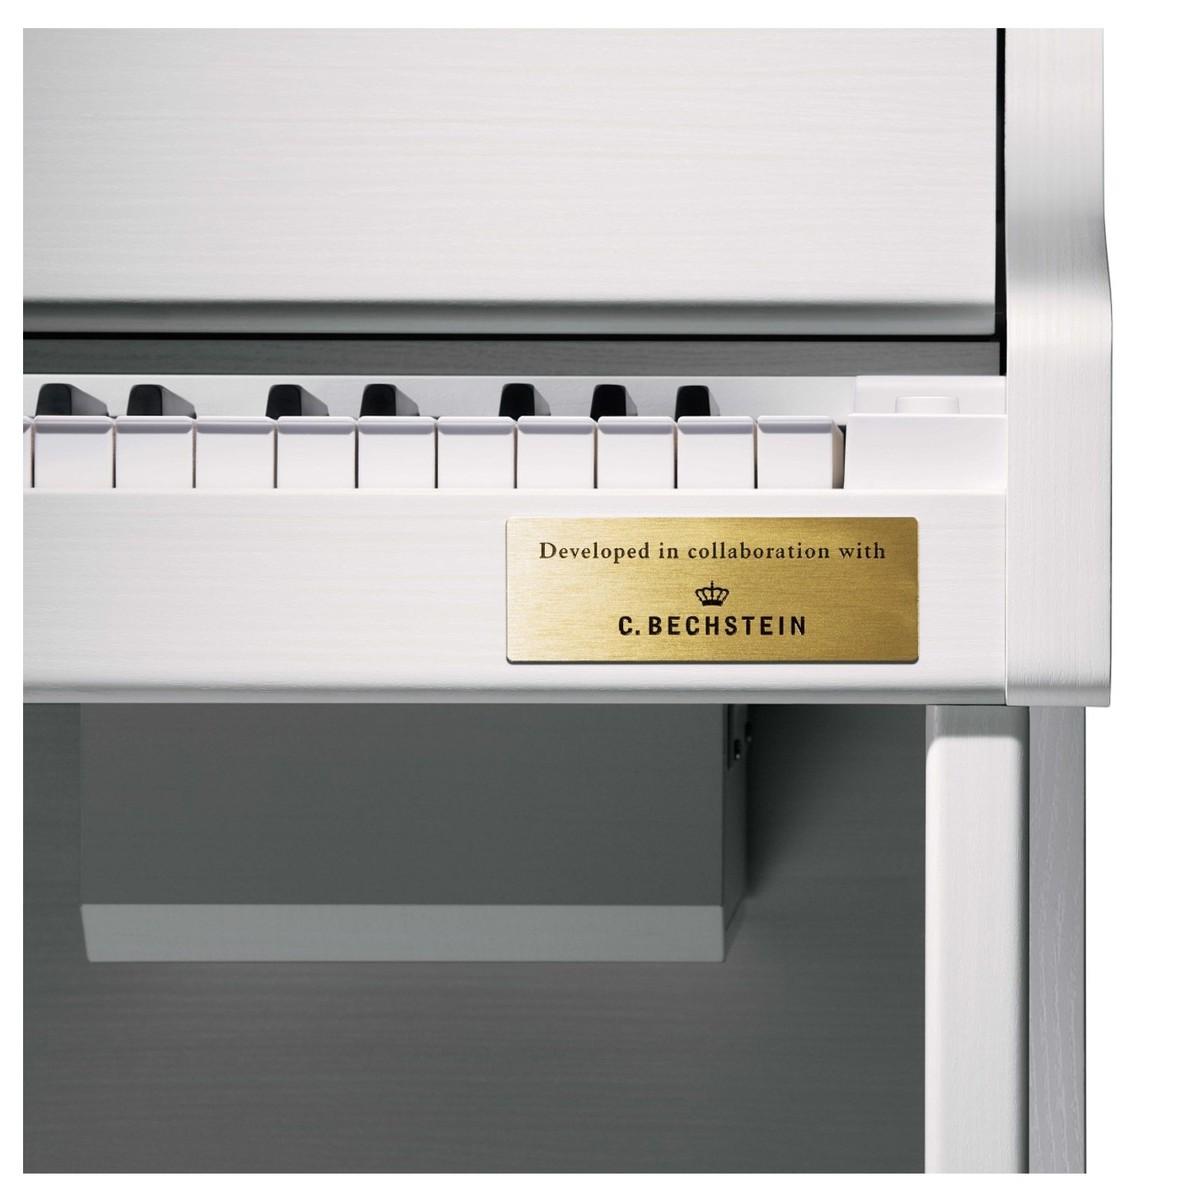 Casio GP-300WE Grand Hybrid Piano keys